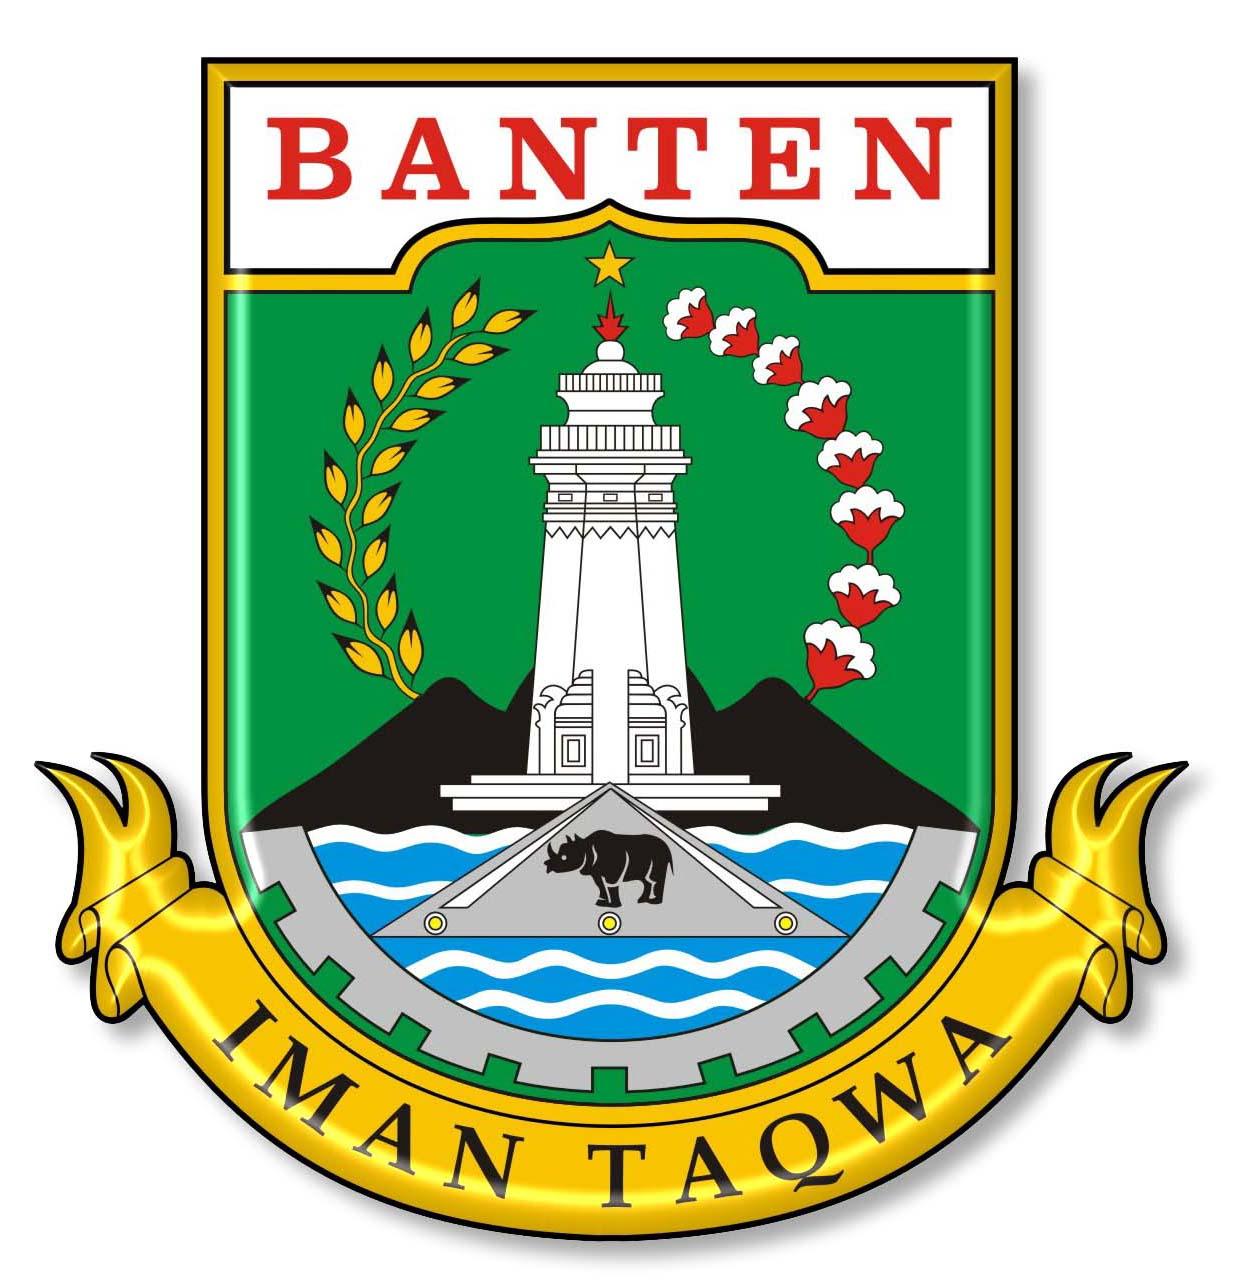 About Banten Banten